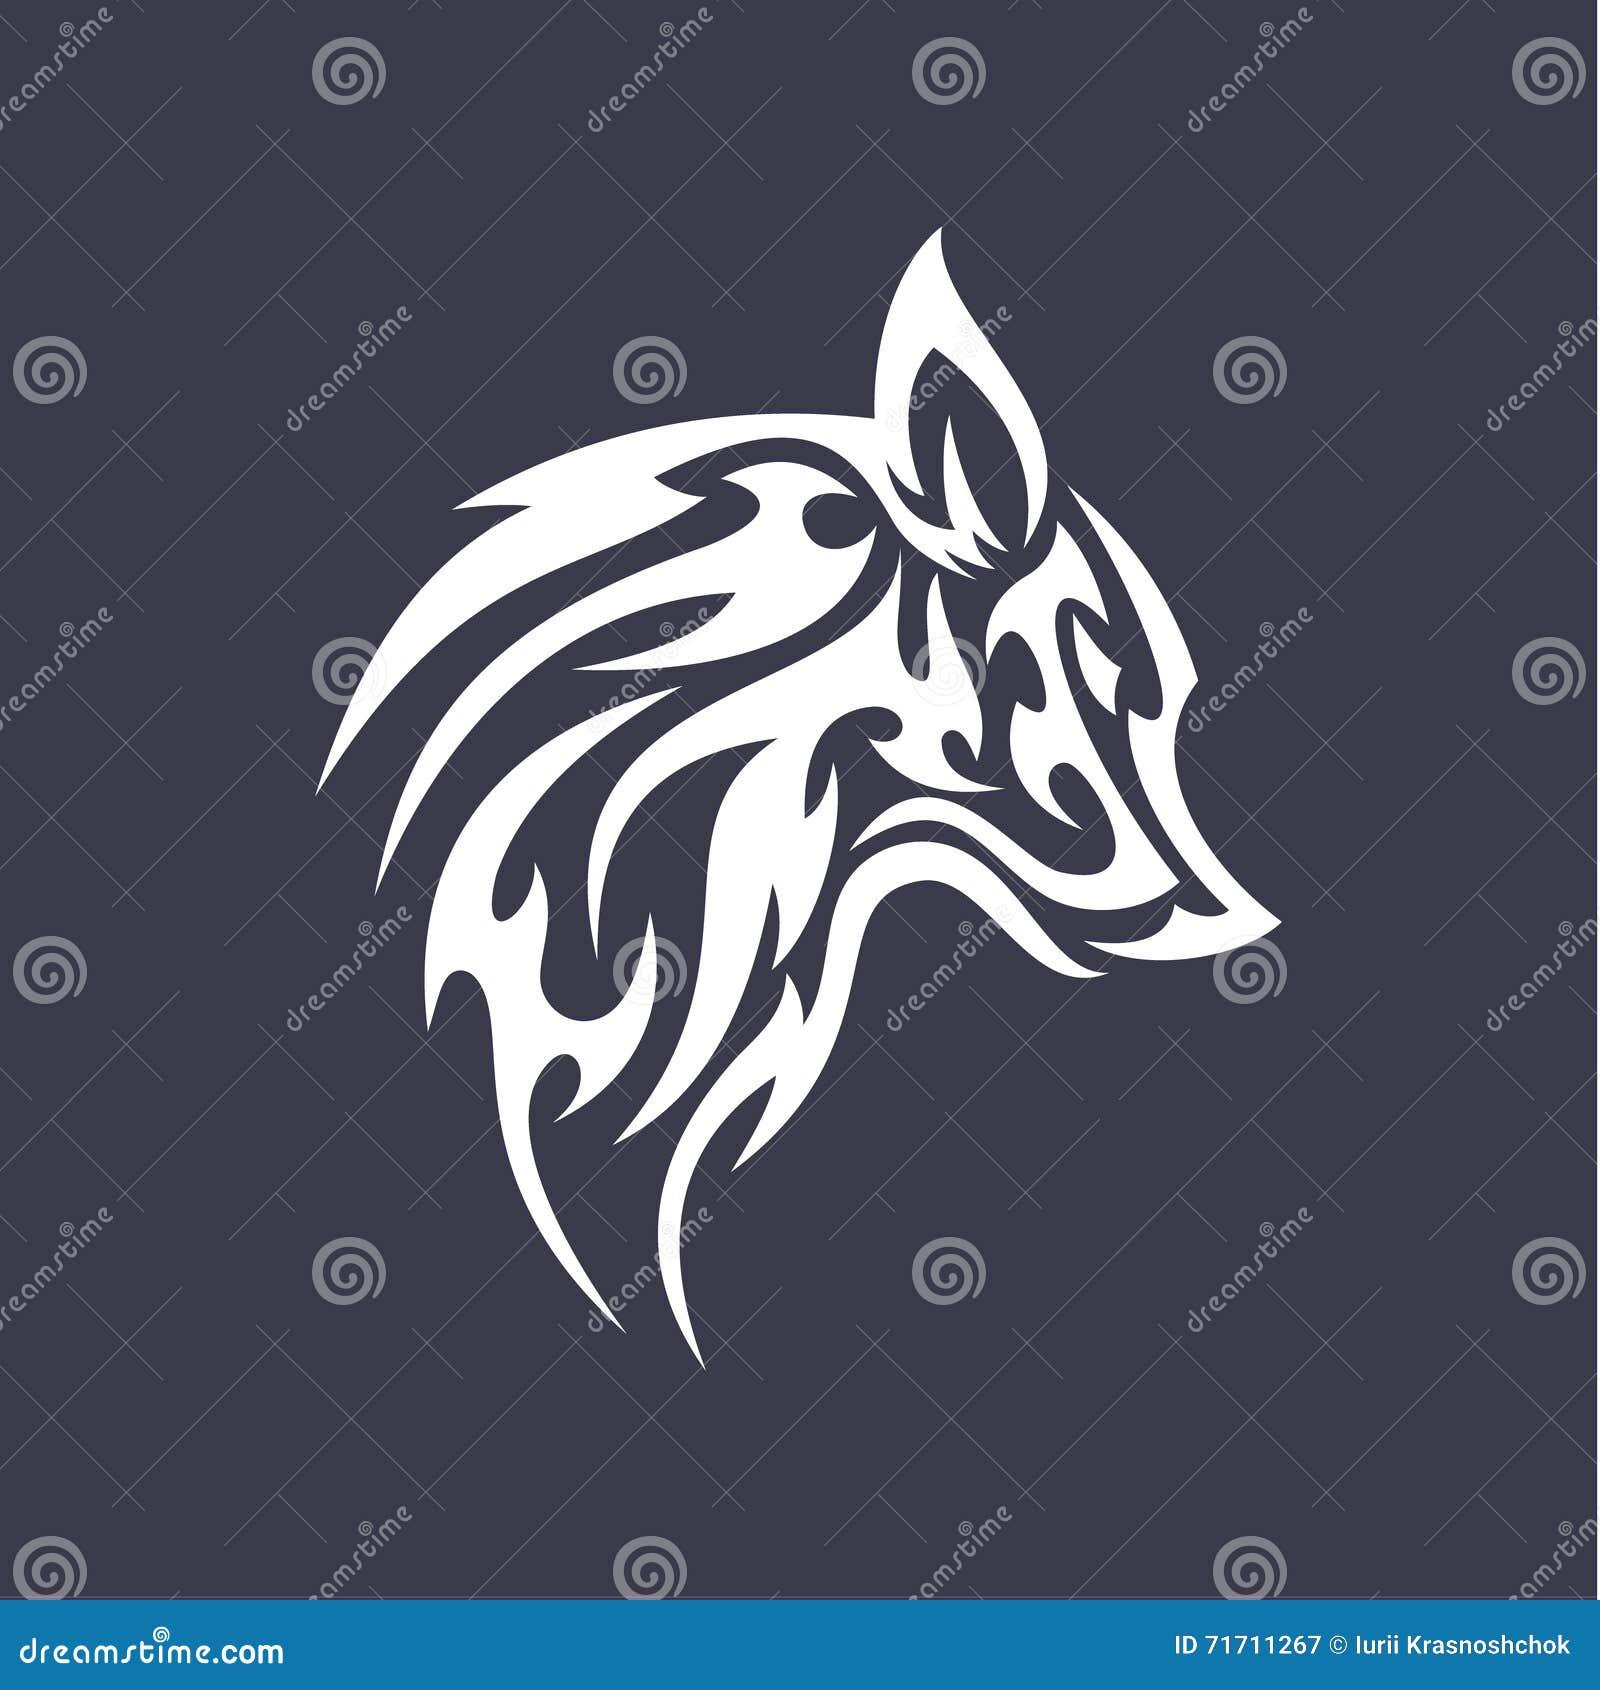 Wolf flat tattoo style logo design vector smoother for Tattoo style logo design